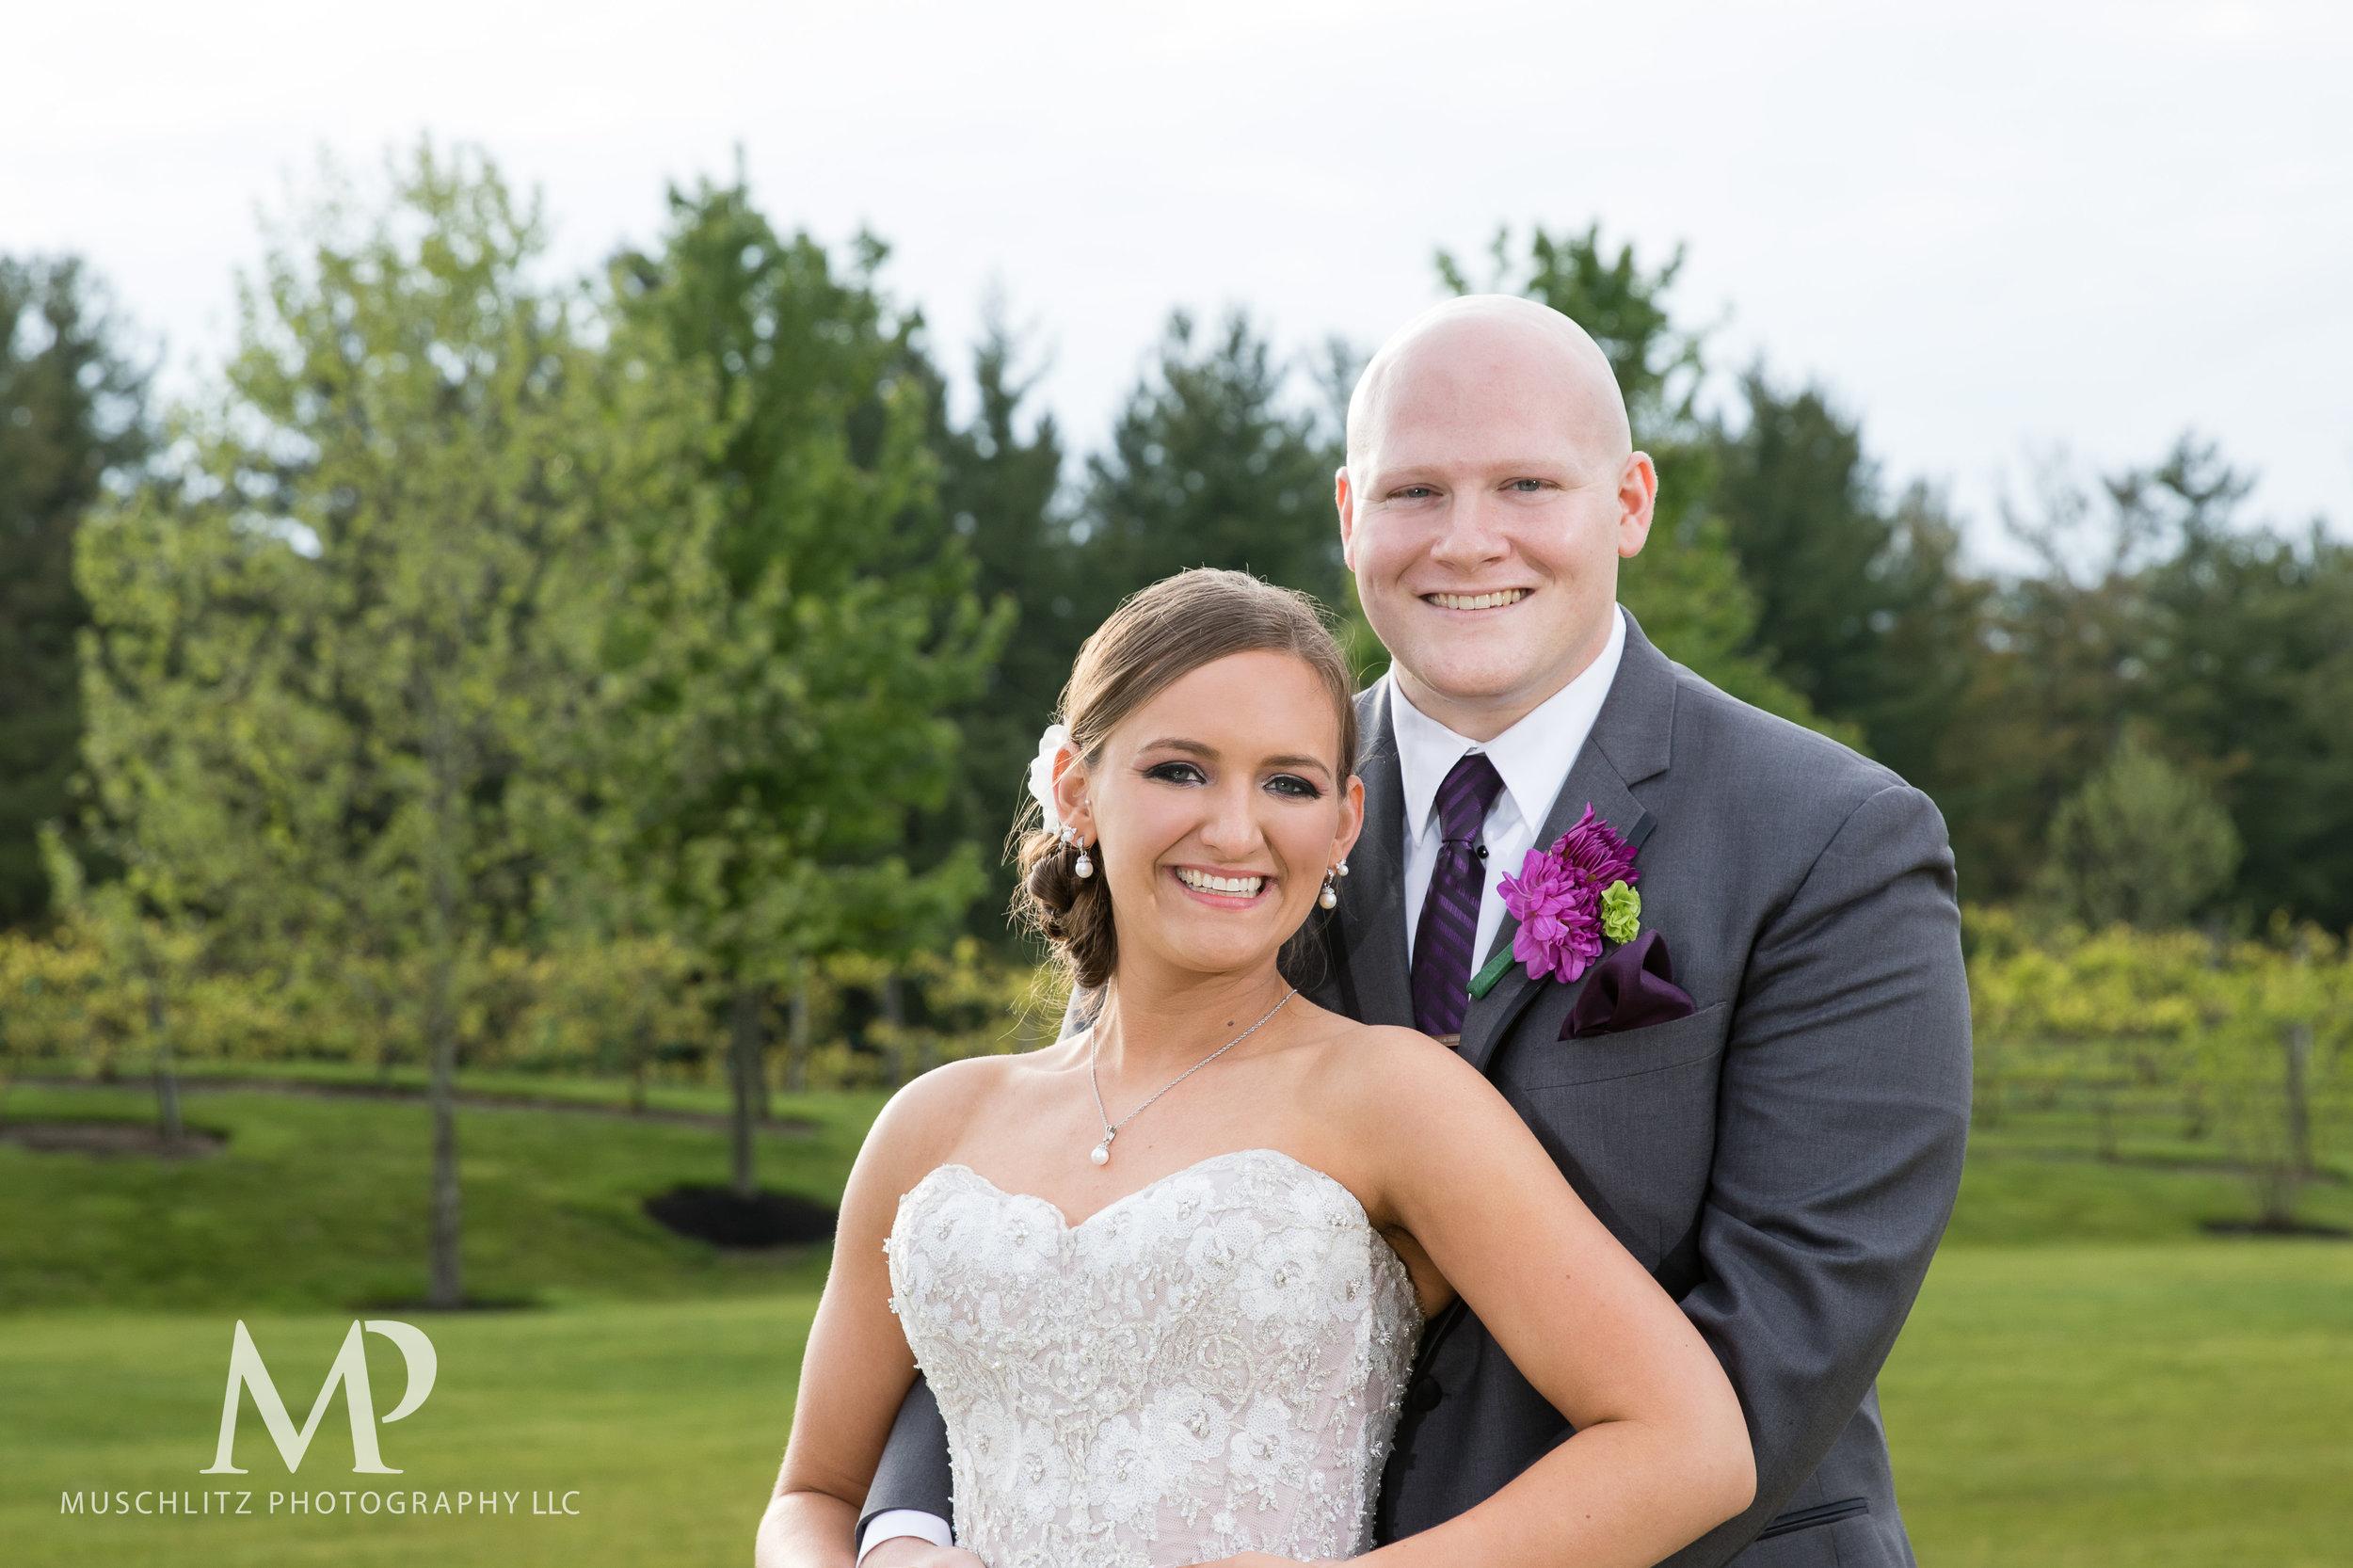 club-at-corazon-wedding-ceremony-reception-columbus-dublin-ohio-ohio-university-theme-057.JPG